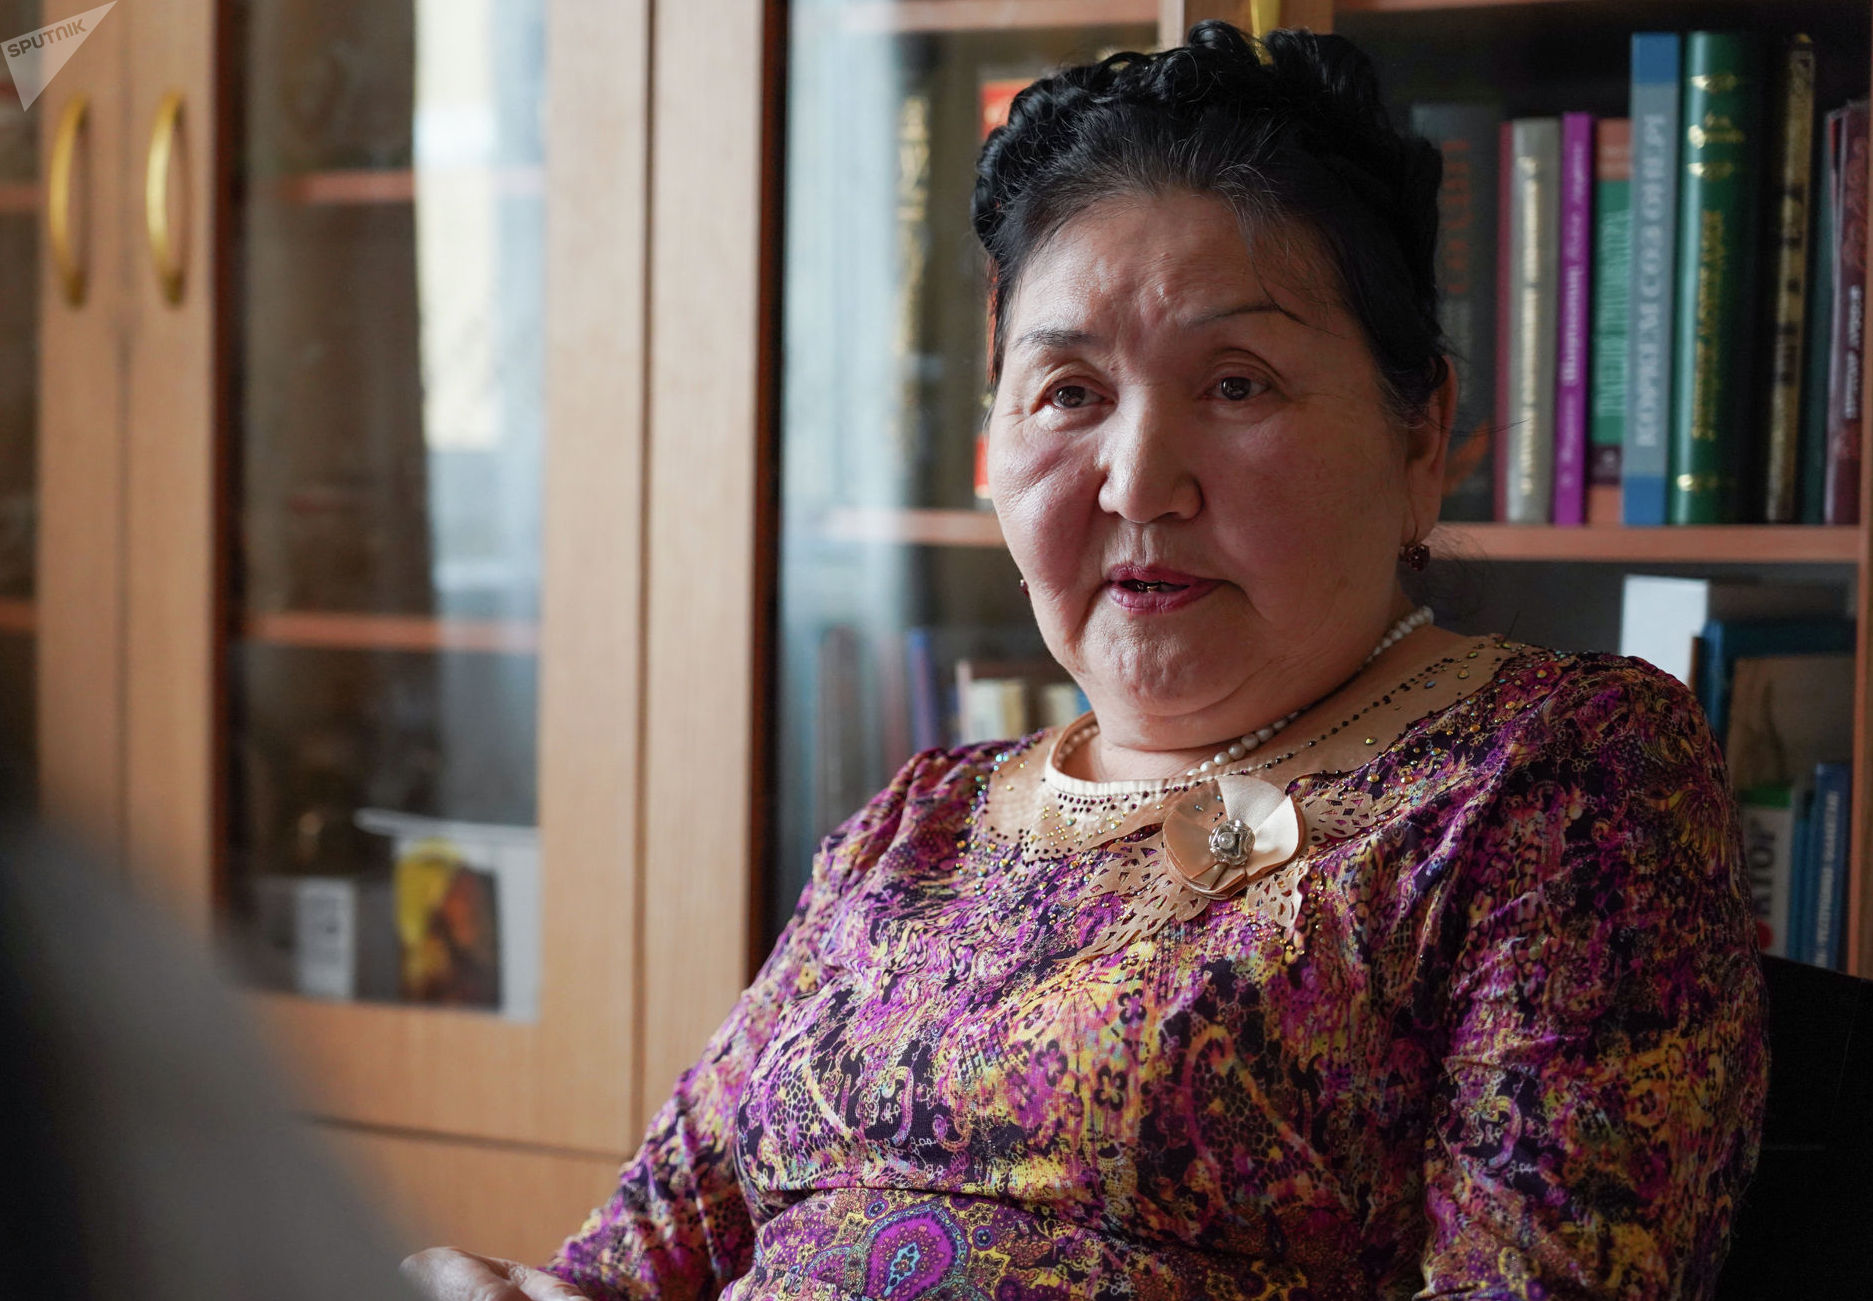 ليايليا بايماگامبەتوۆا - پراپراۆنۋچكا كازاحسكوگو پوەتا ي مىسليتەليا ابايا كۋنانباەۆا